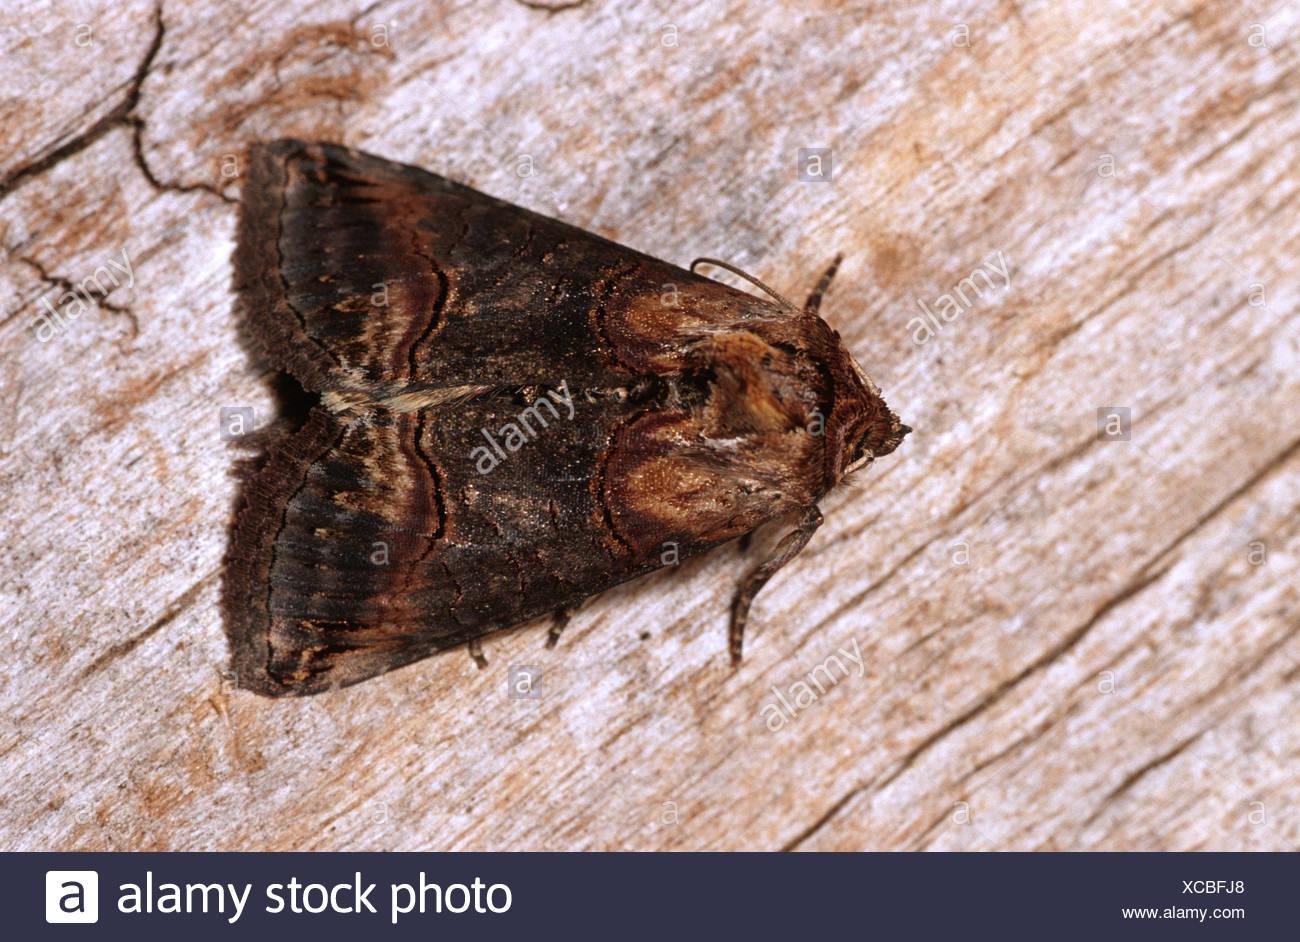 Dark spectacles (Abrostola triplasia), on deadwood, Germany - Stock Image